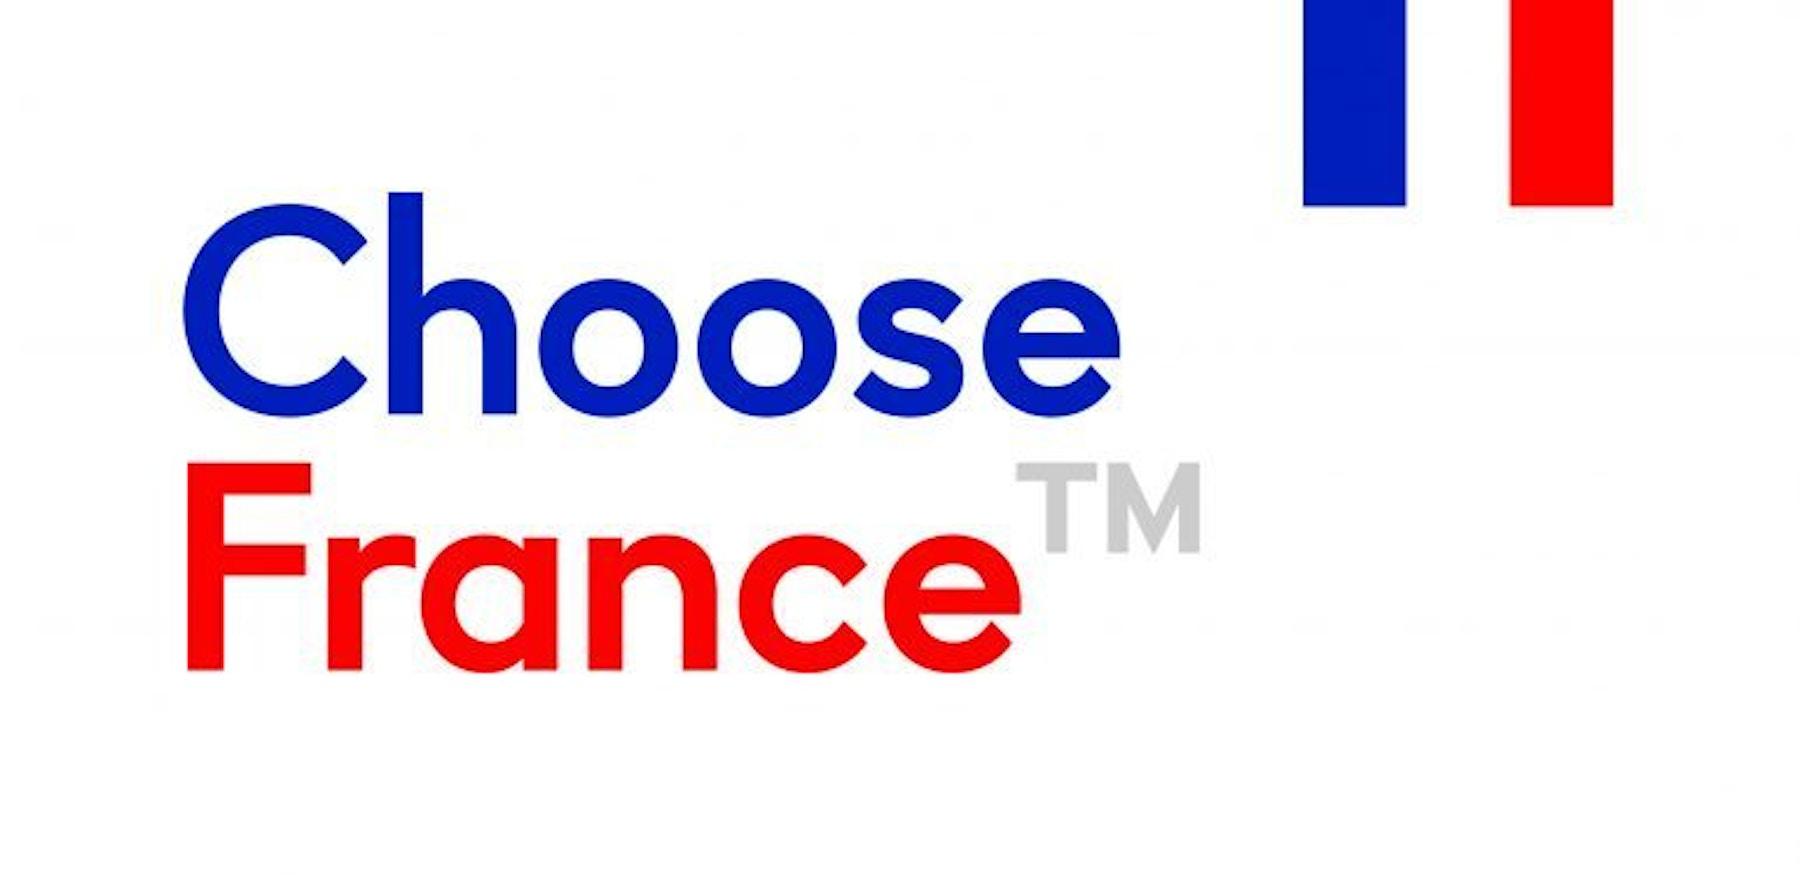 Choose France logo 770x375 jpg